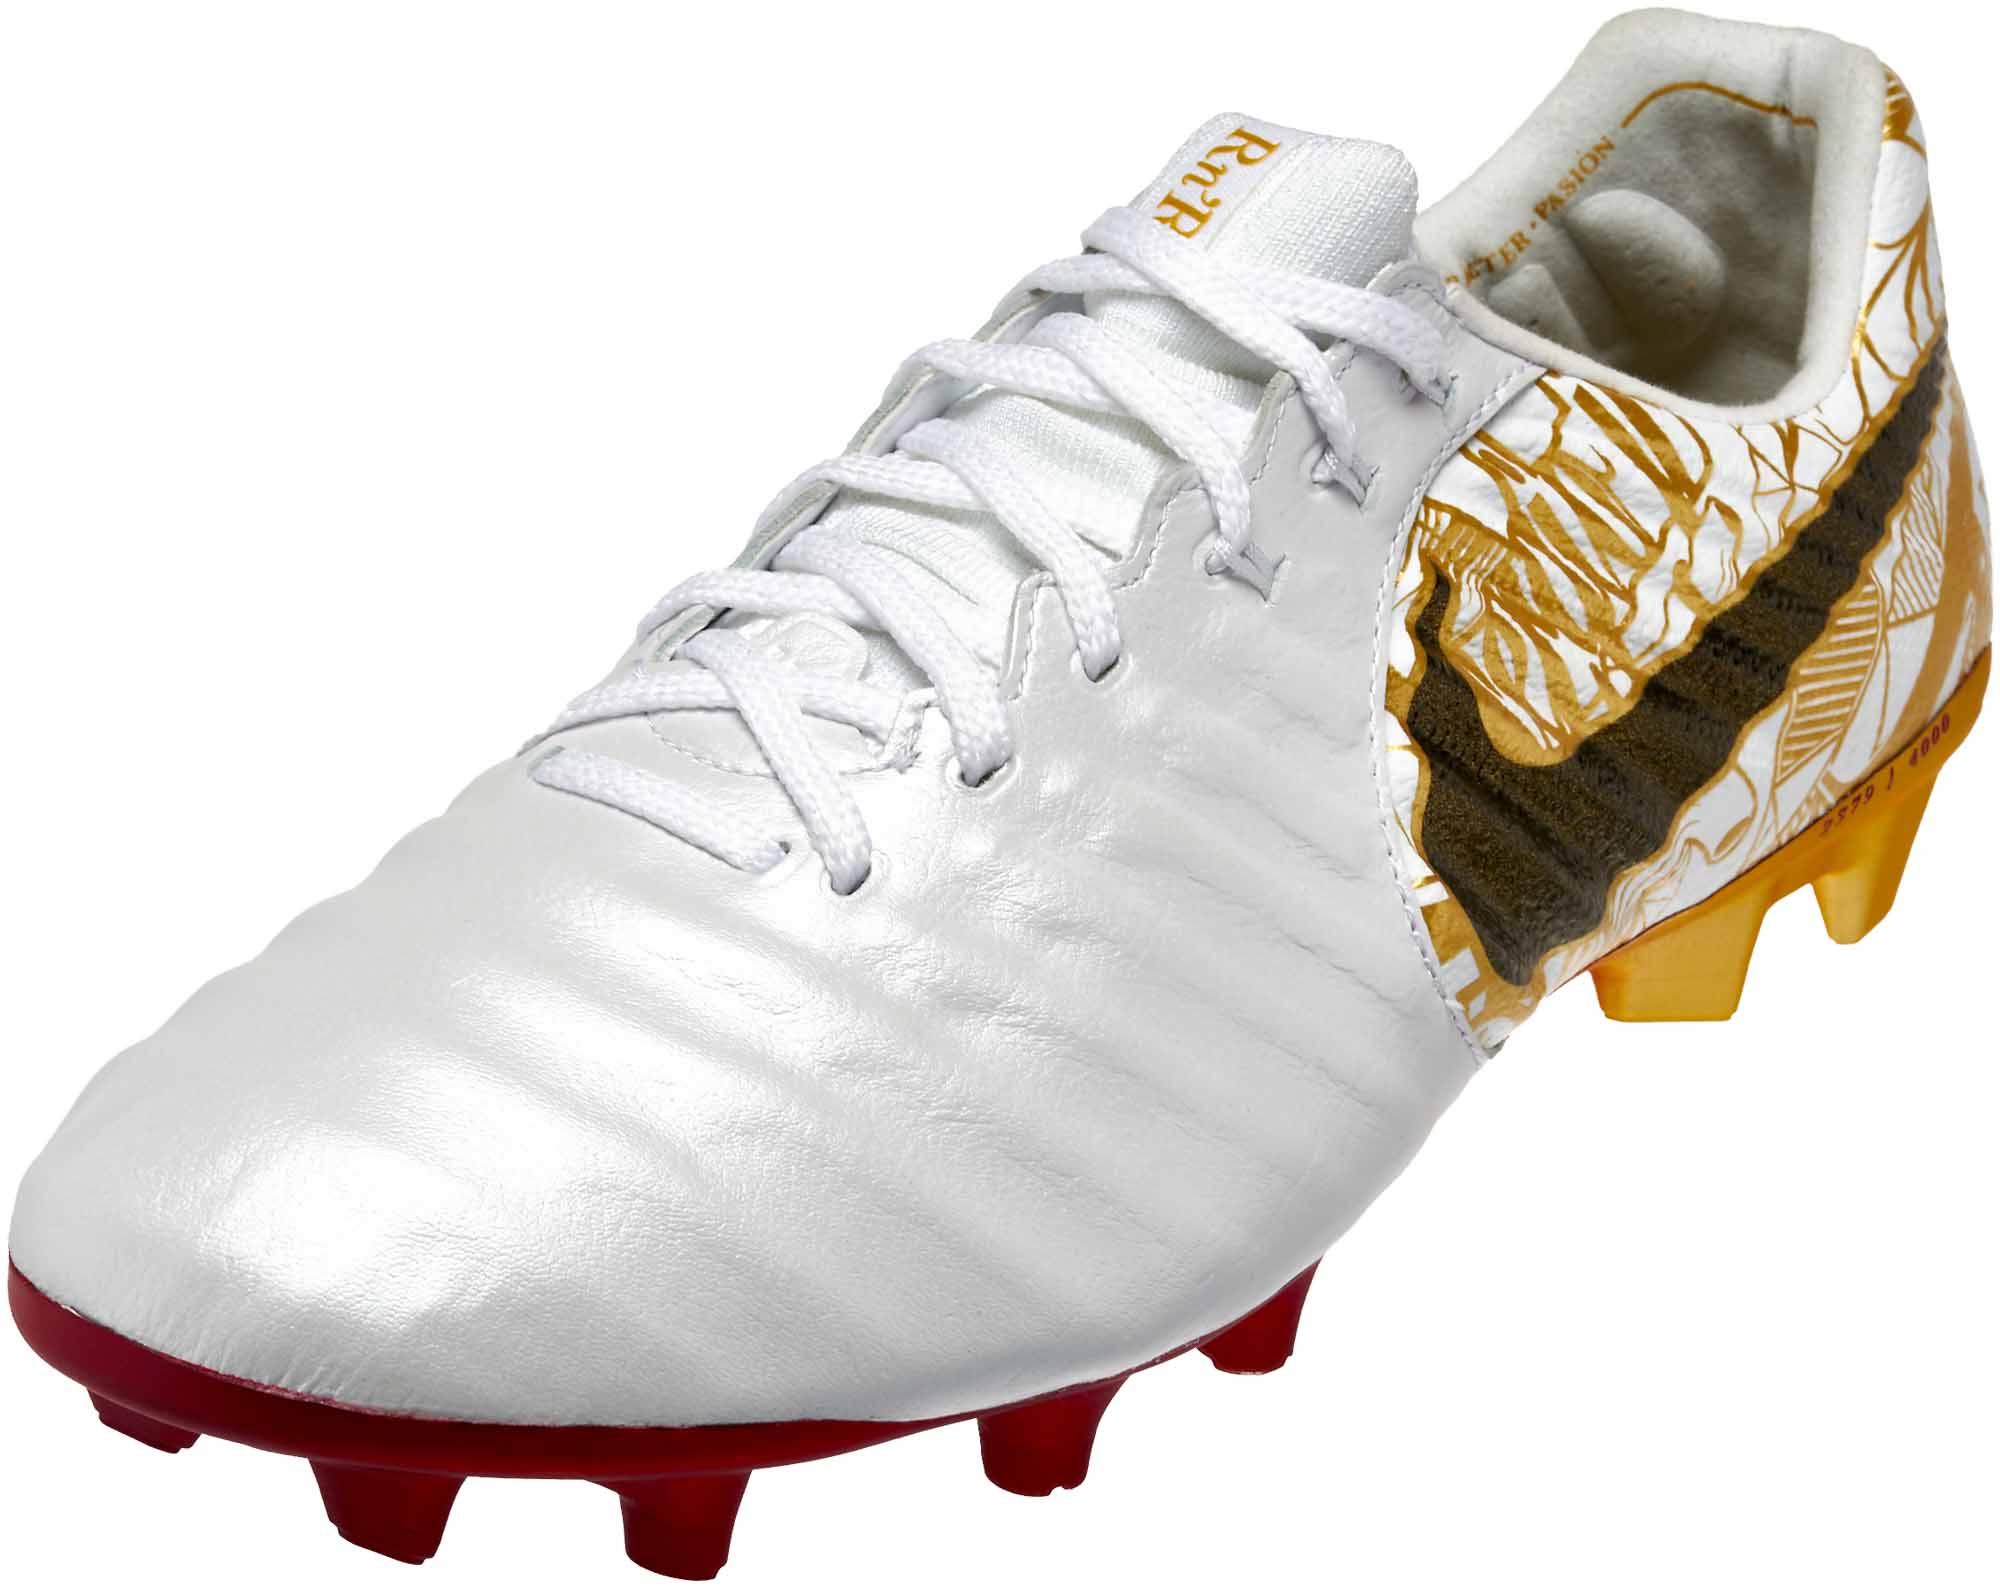 079b8eb7b92085 Nike Tiempo Legend VII SE FG – Sergio Ramos – White Metallic Vivid Gold